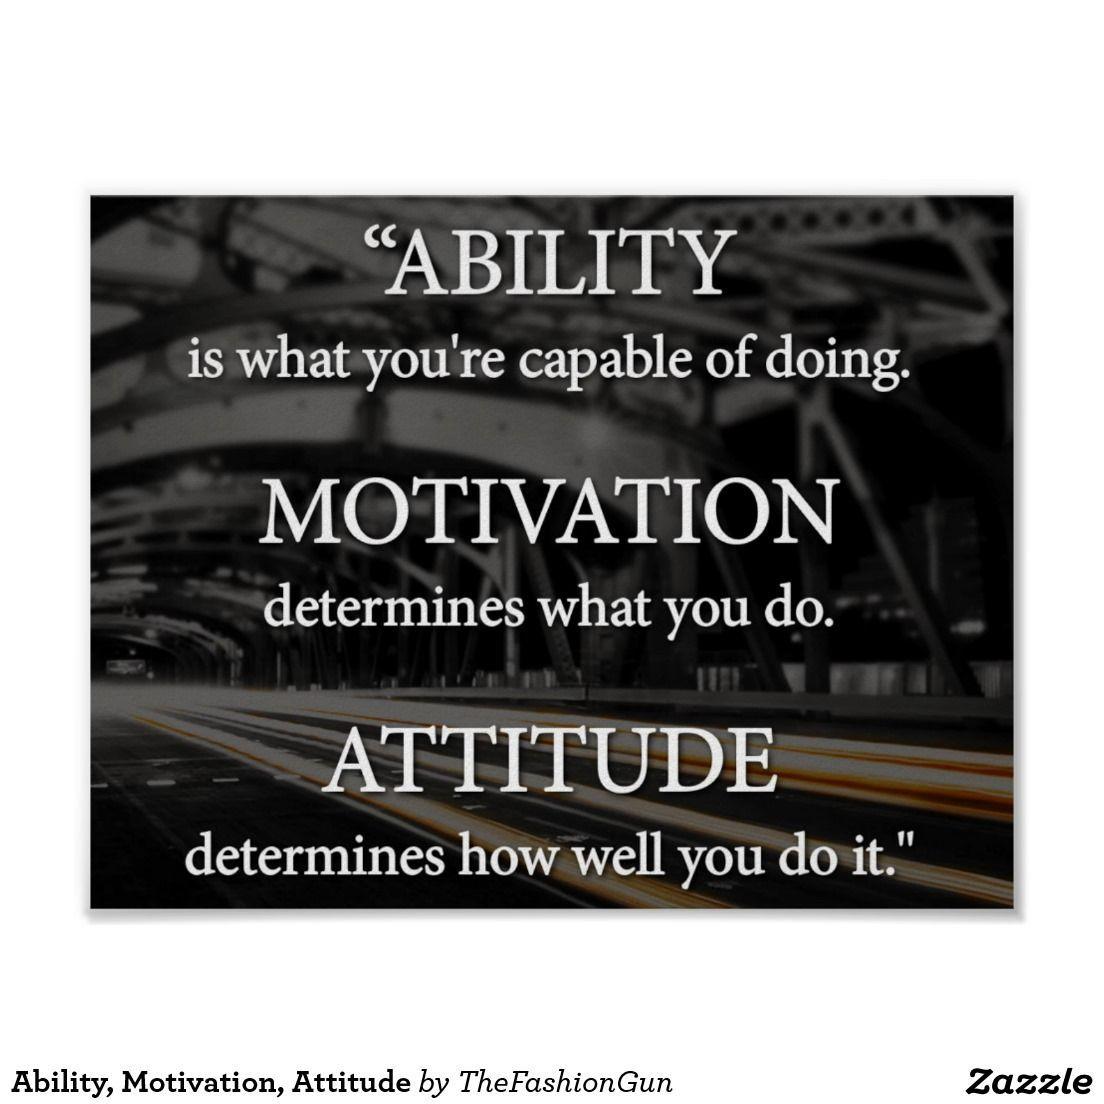 Motivation, Attitude Poster |  Ability, Motivation, Attitude PosterAbility, Motivation, Attitude Poster